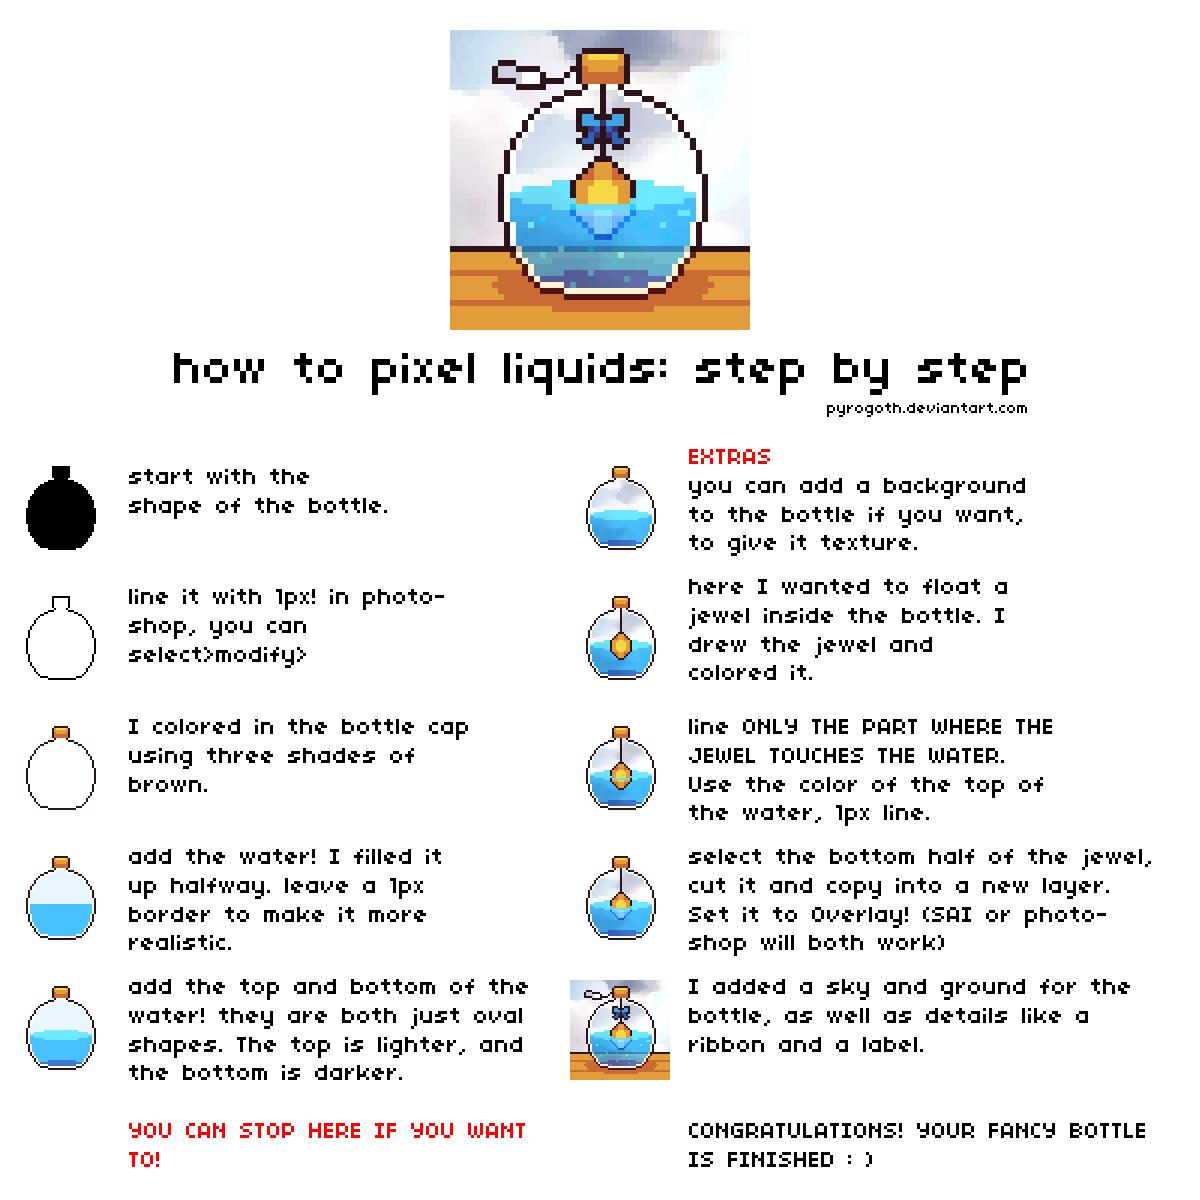 Tutorial: Pixel liquids